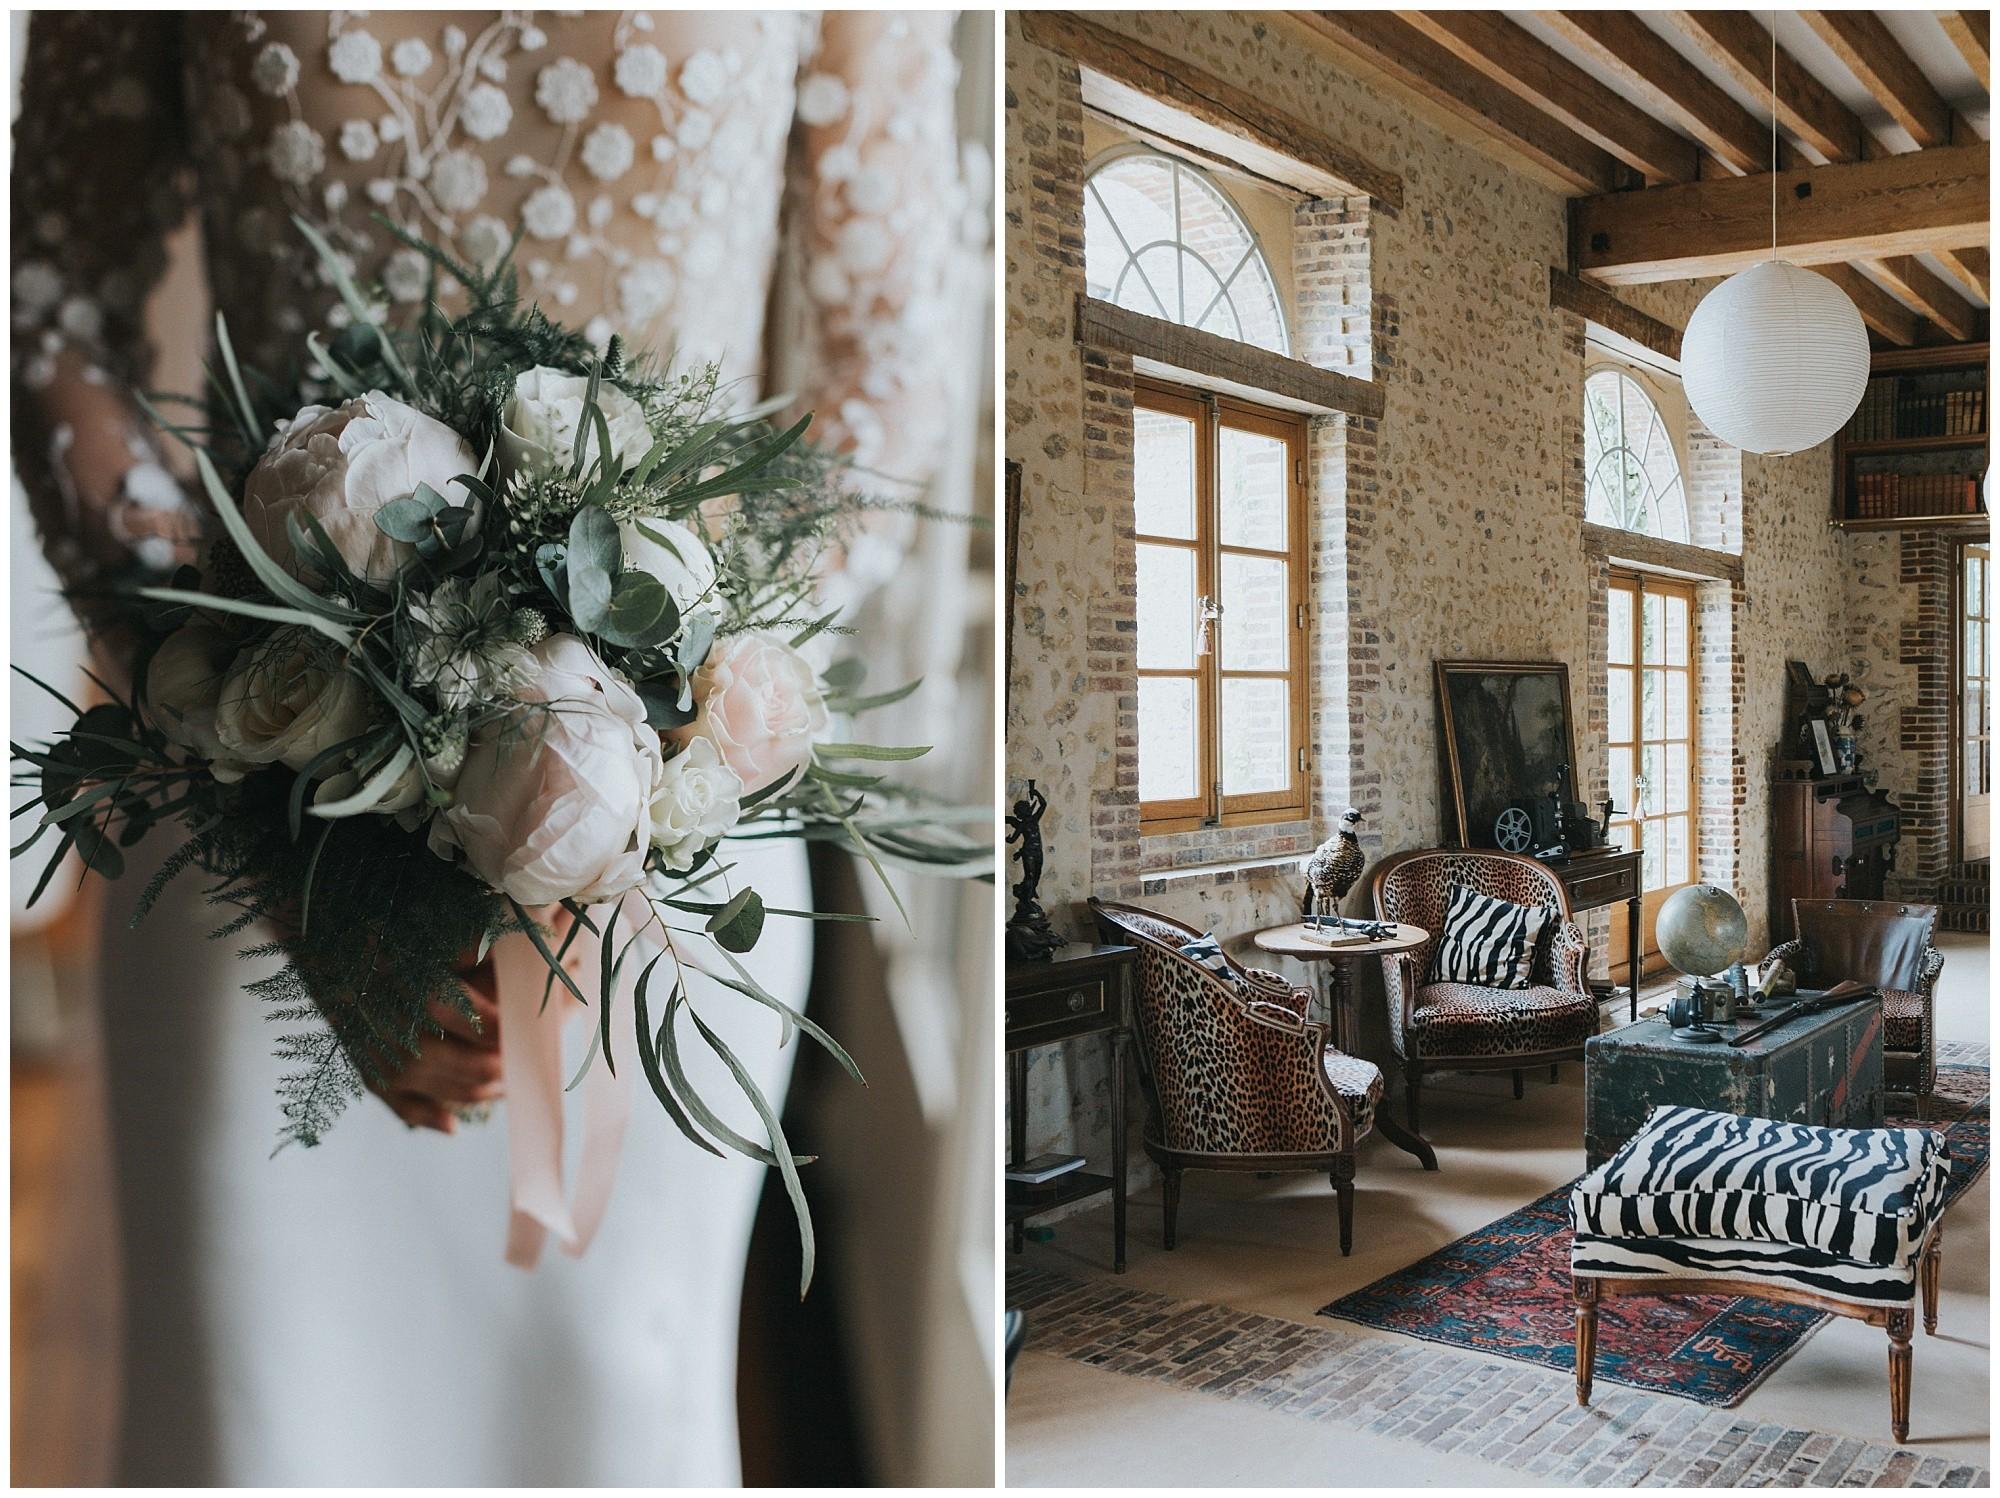 Kateryna-photos-photographer-reims-domaine-des-evis-mariage-normandie-rime-arodaky_0225.jpg